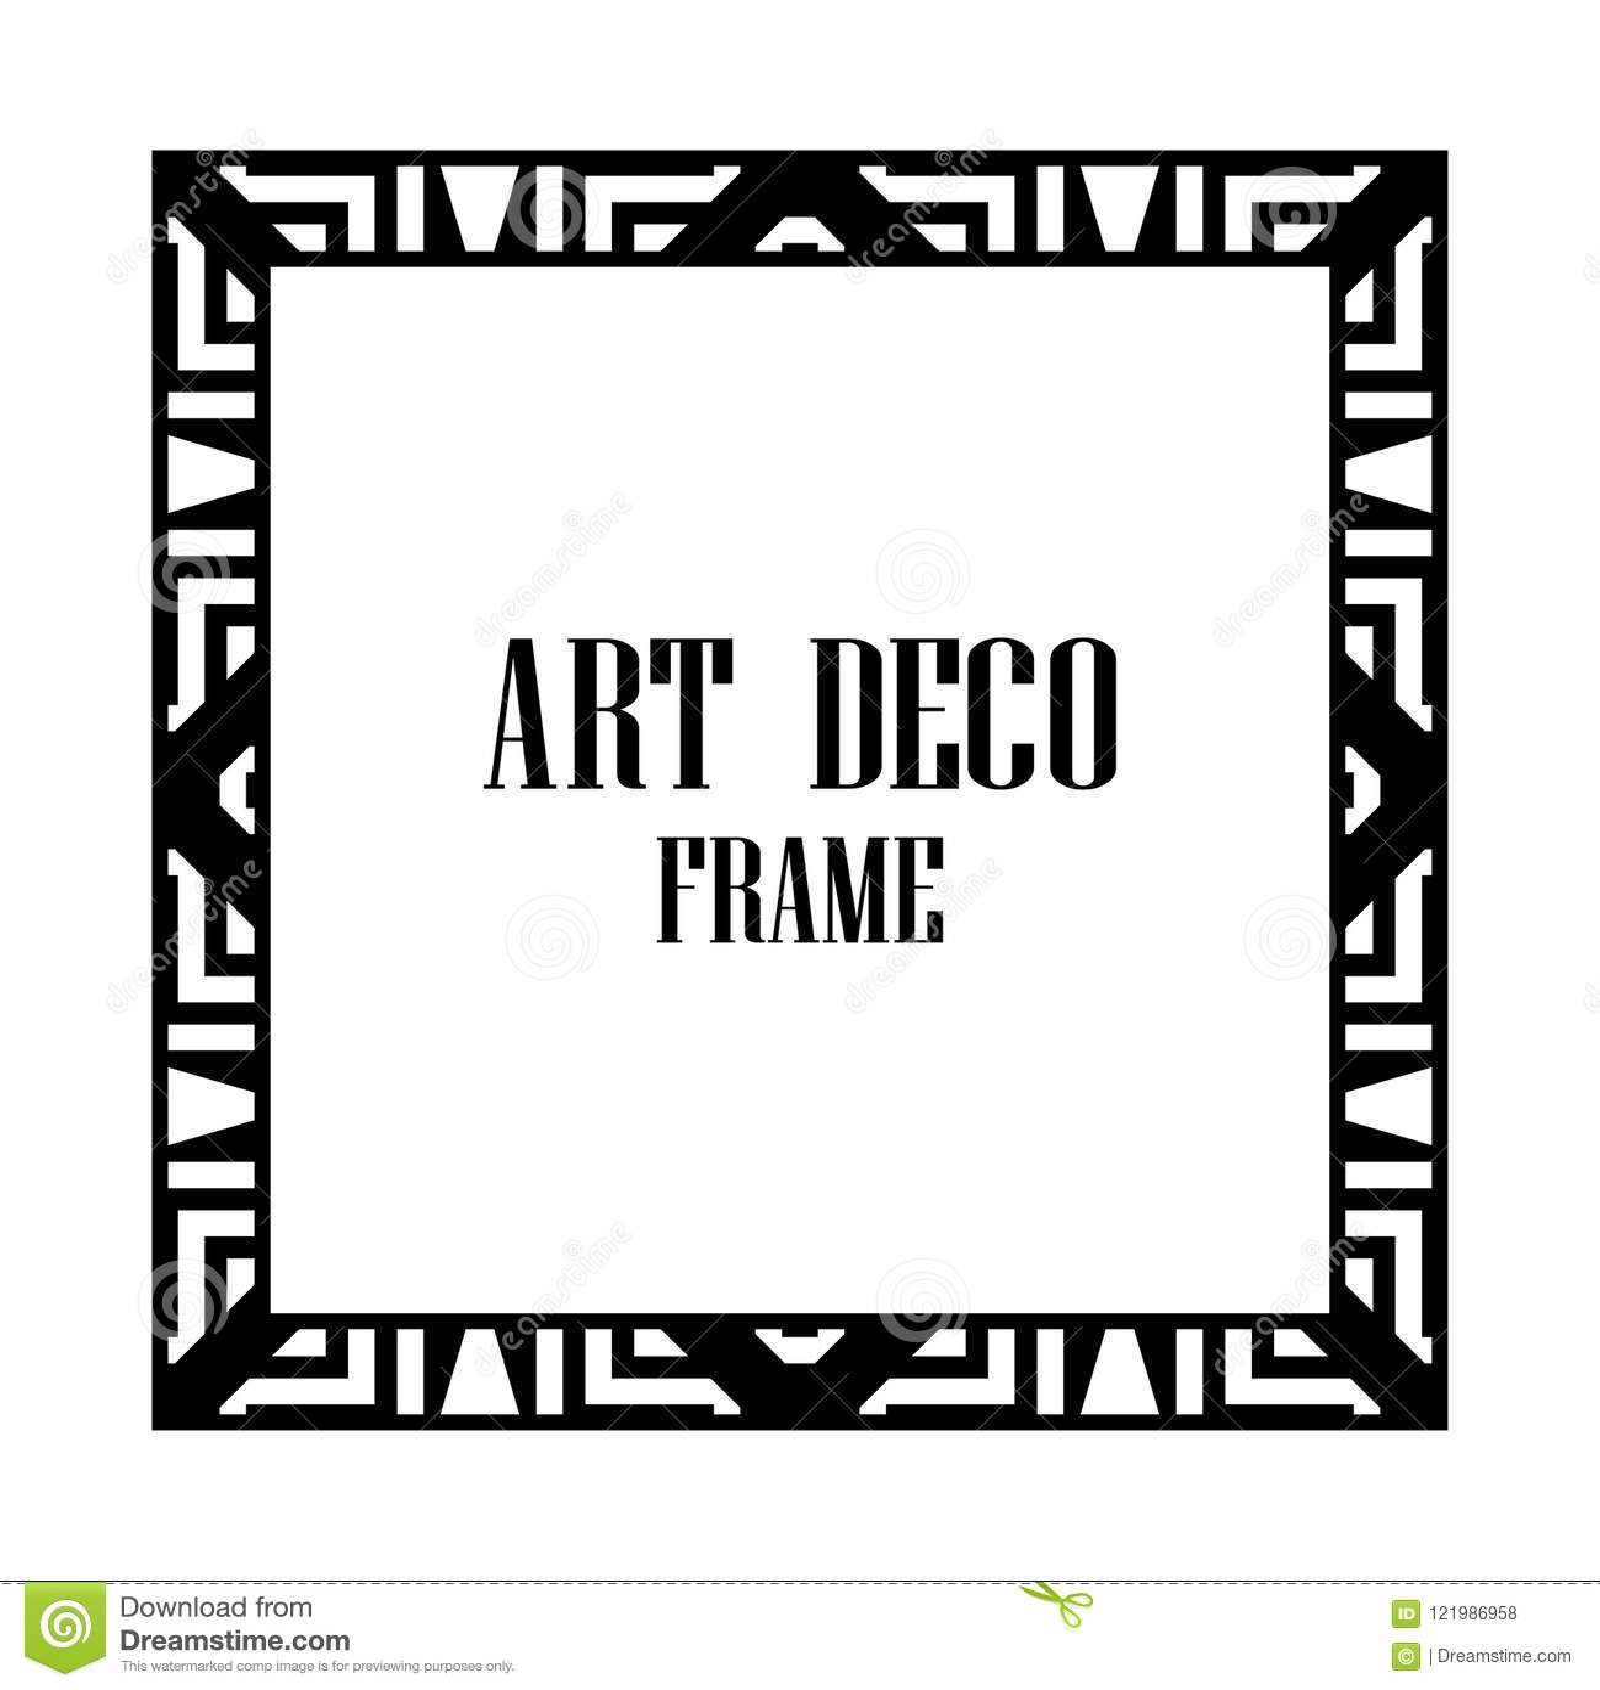 Art Deco Frame Stock Vector Illustration Of Great Gatsby 121986958